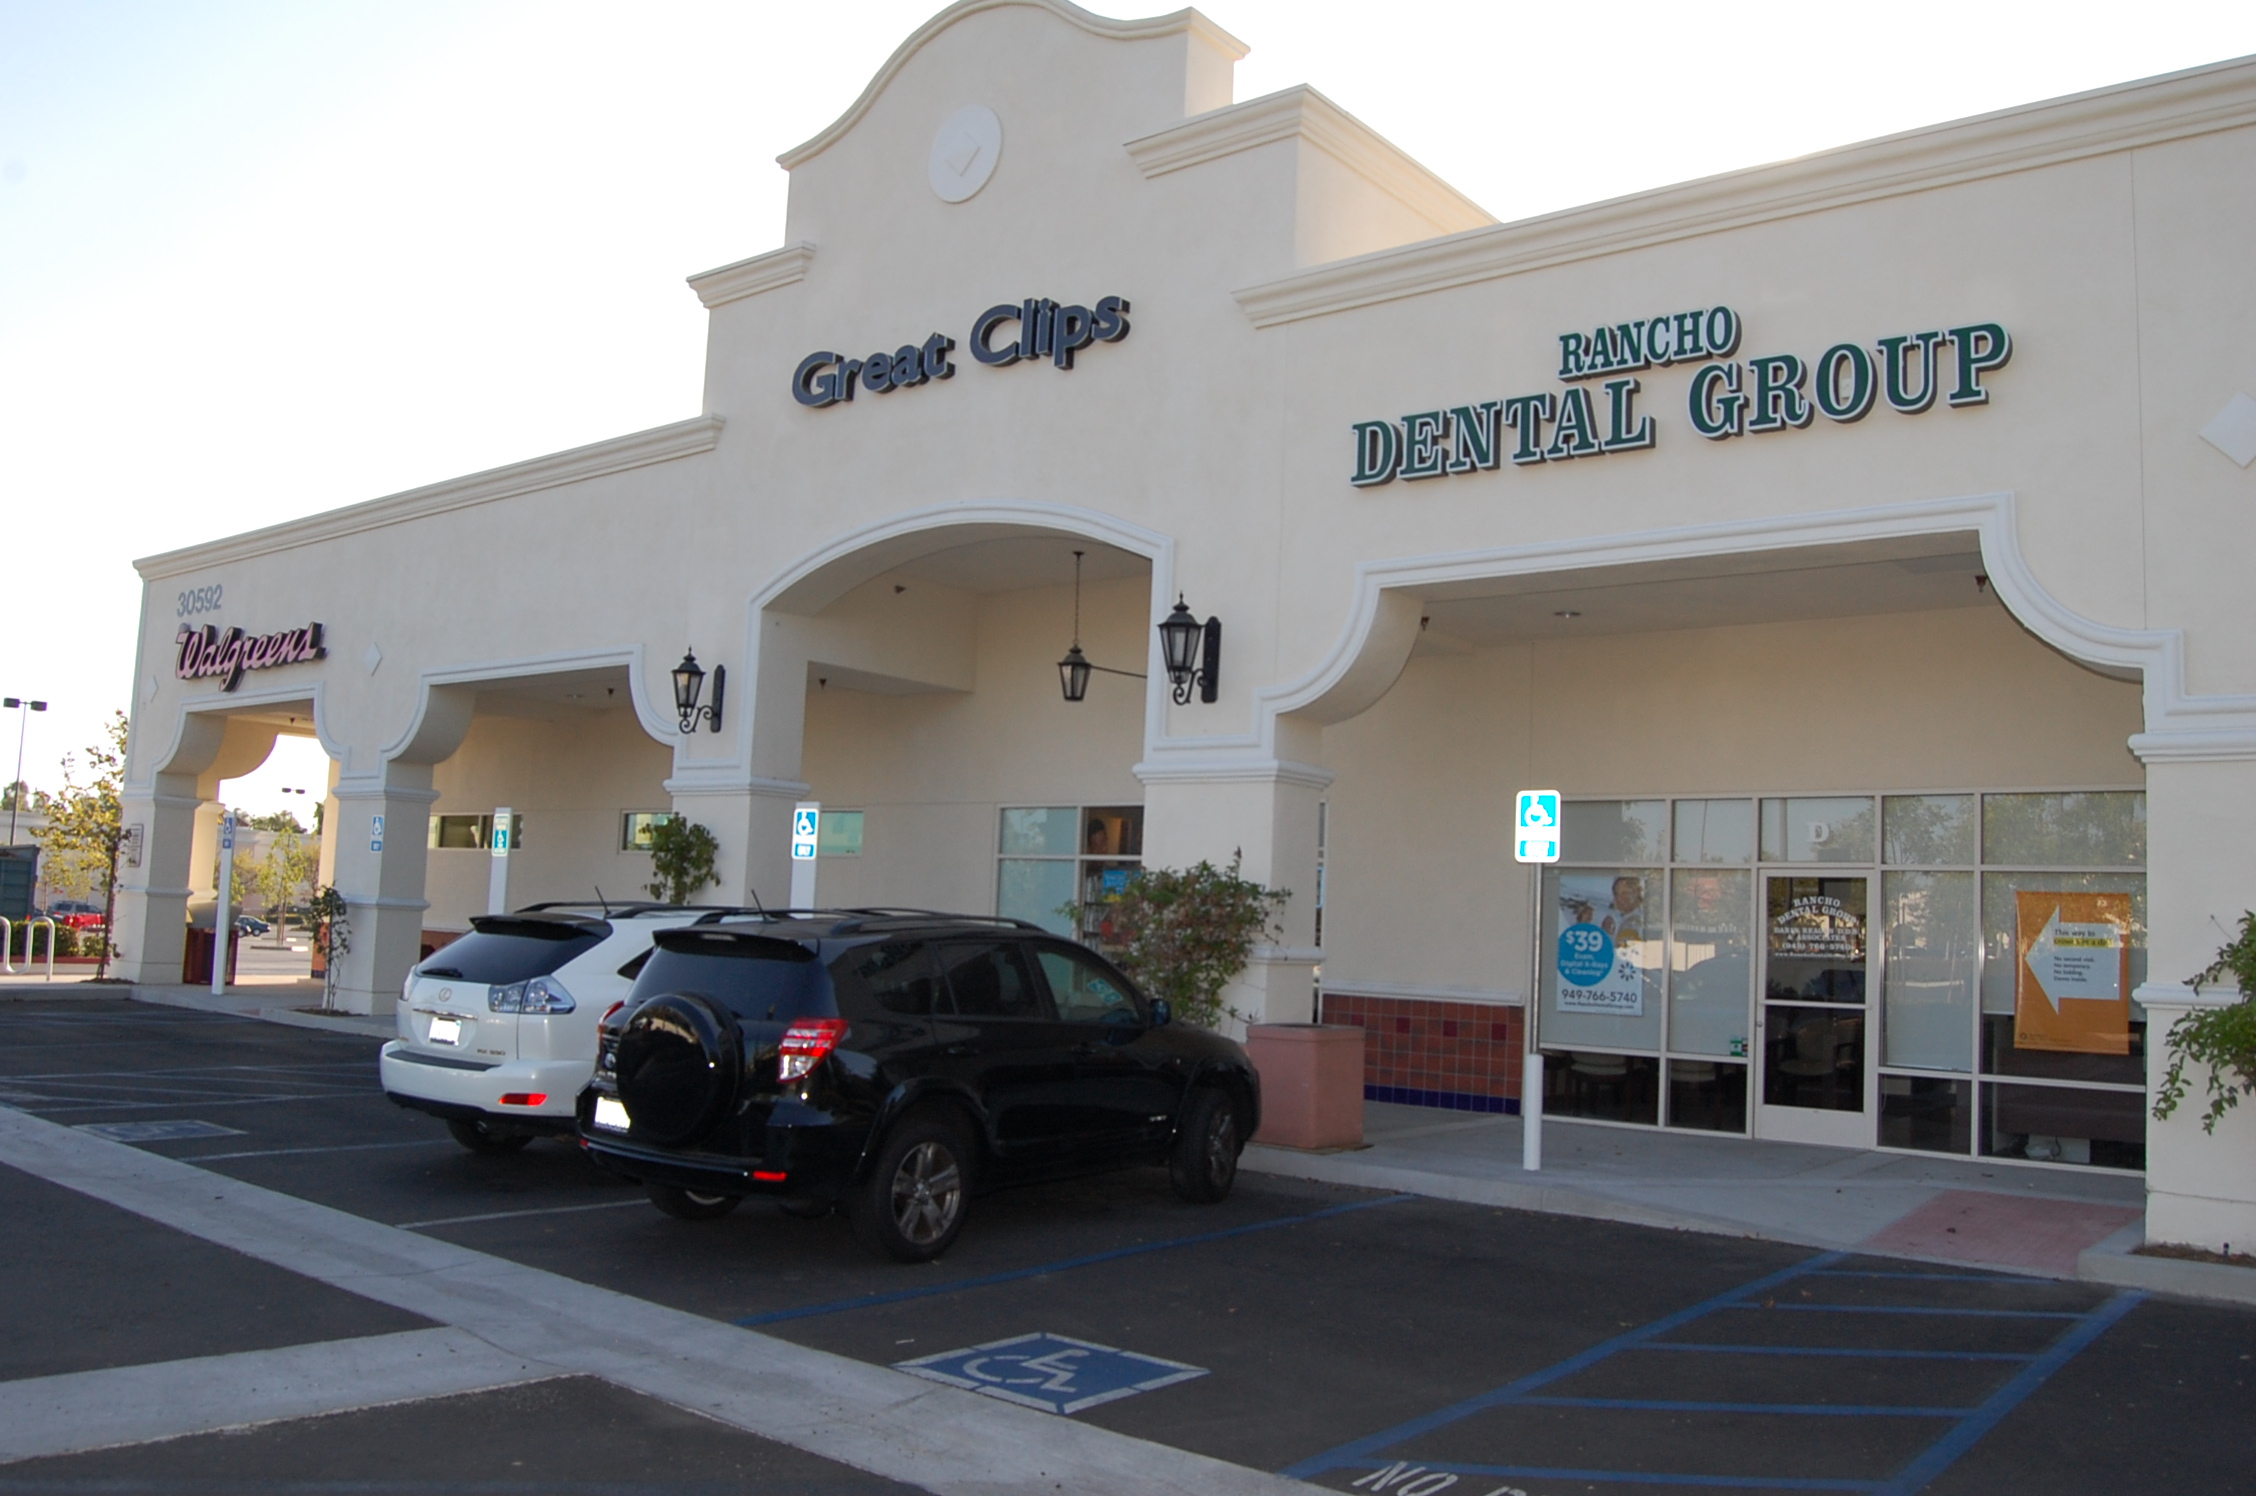 Rancho Dental Group and Orthodontics image 1